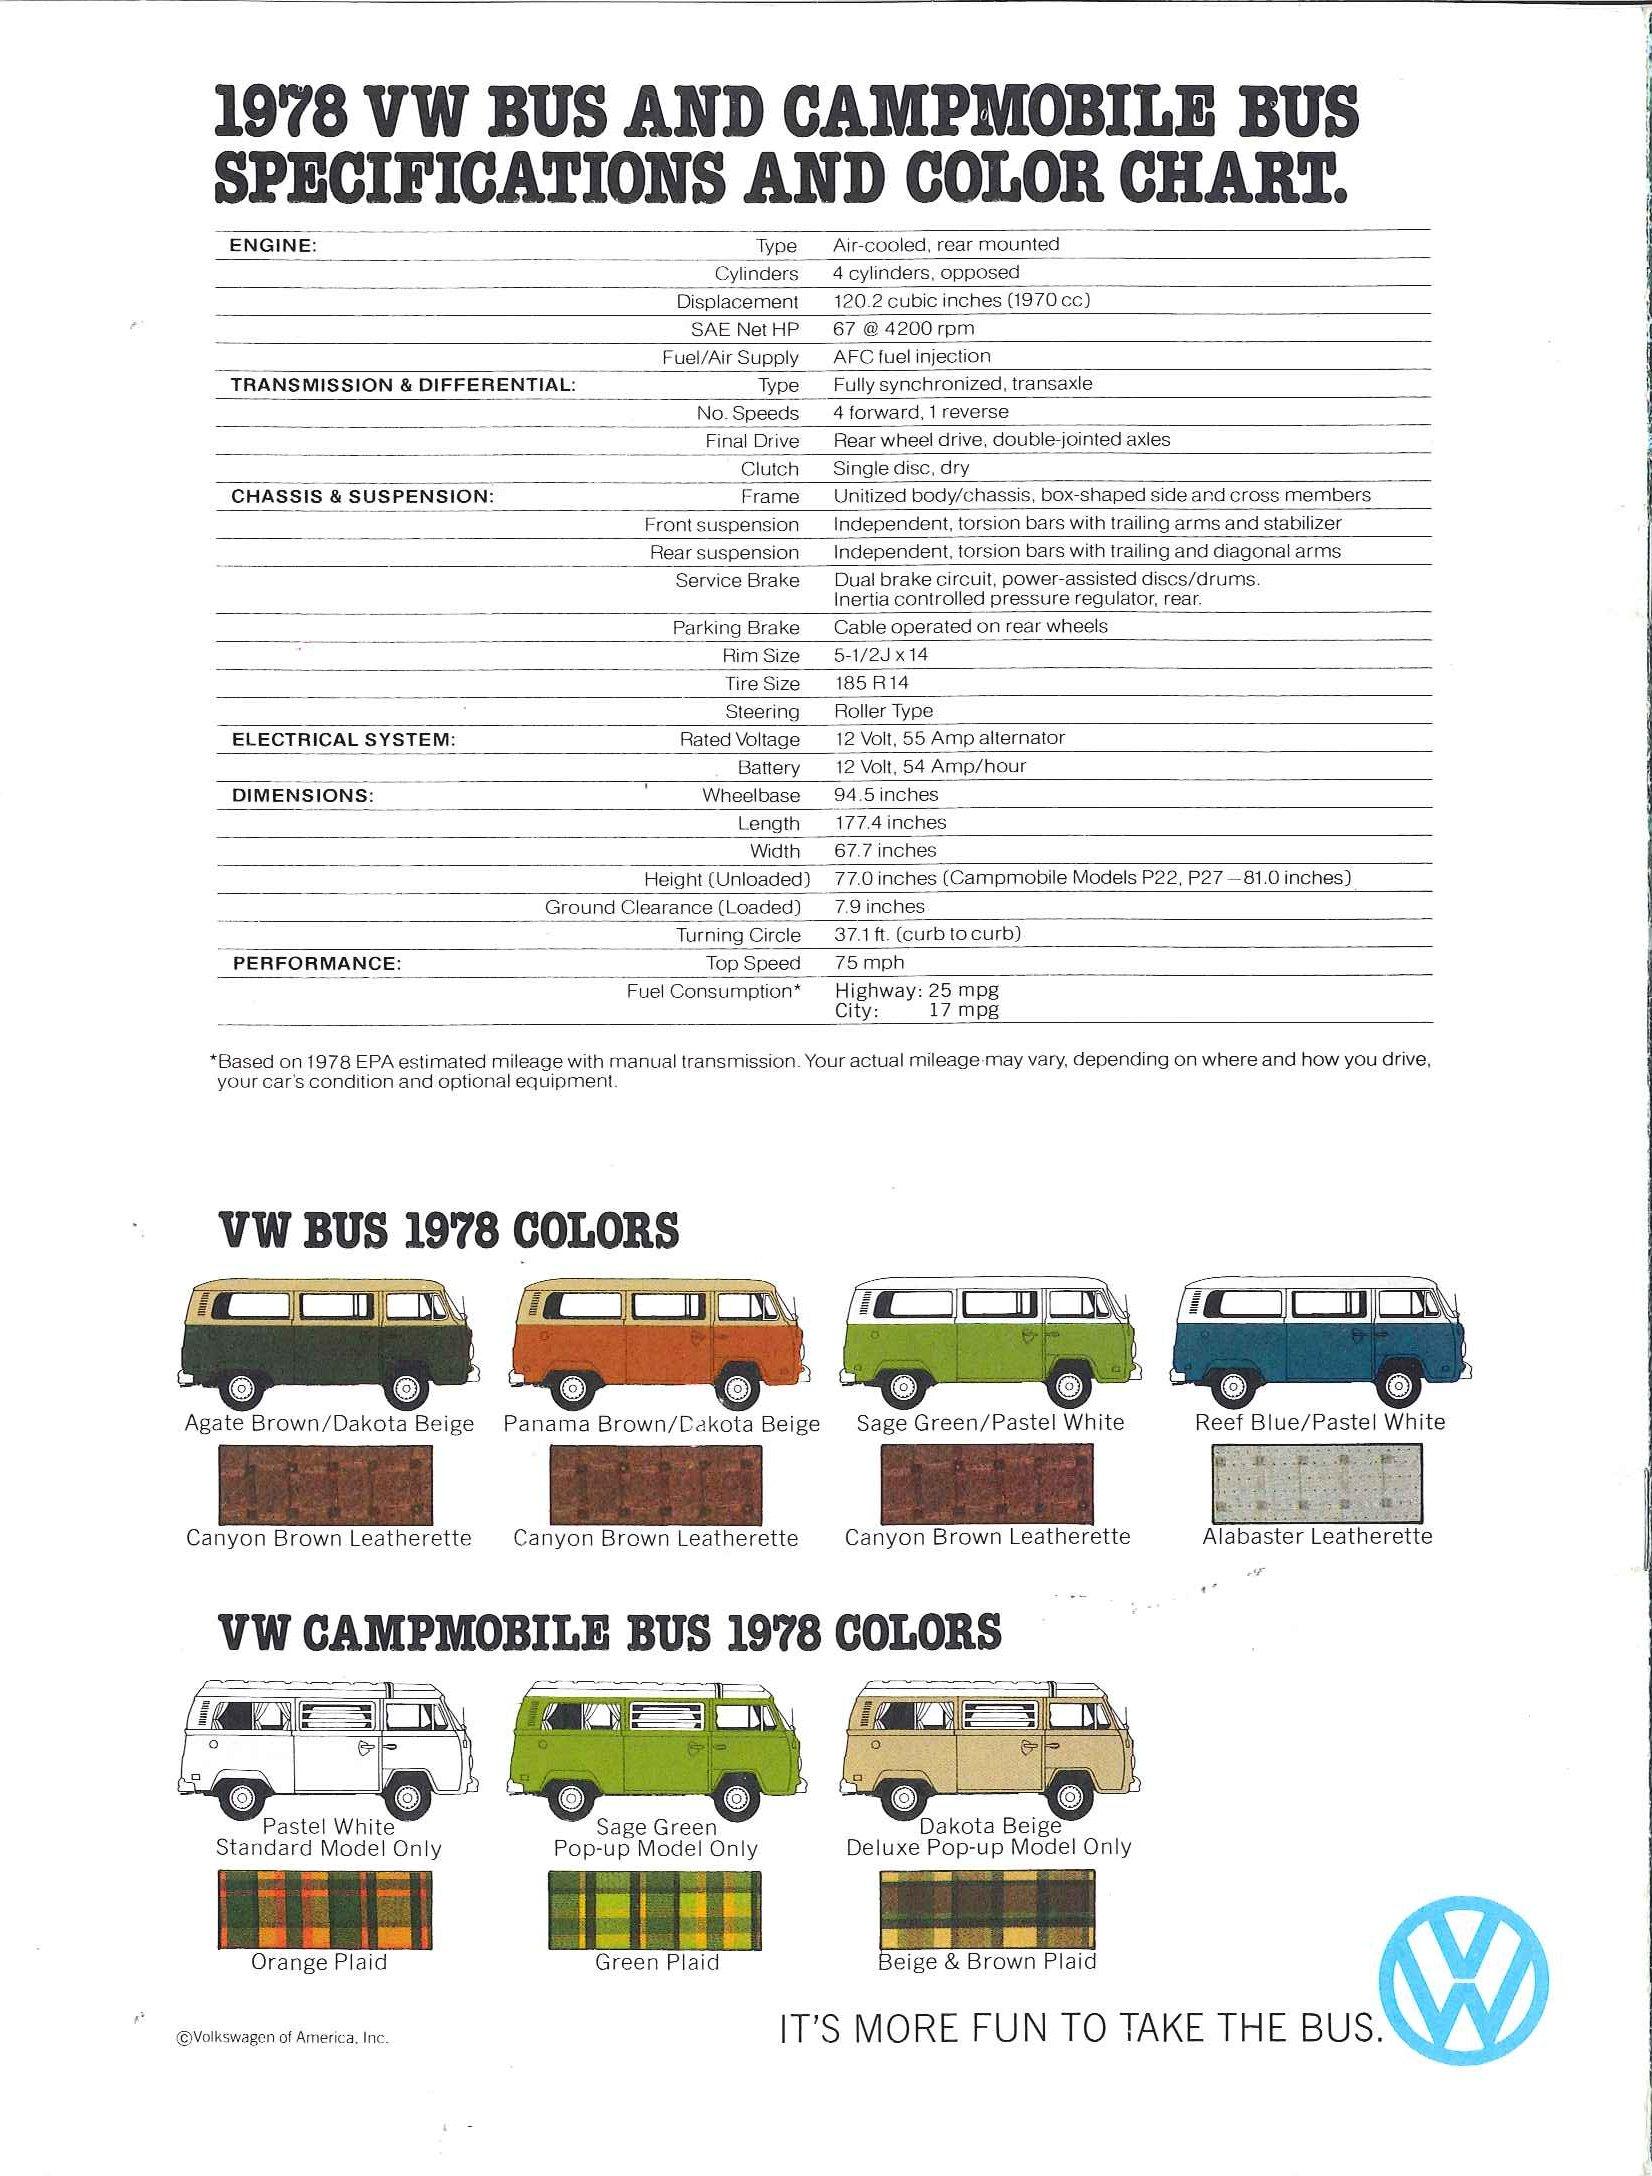 Thesamba vw archives 1978 vw bus sales brochure nvjuhfo Images